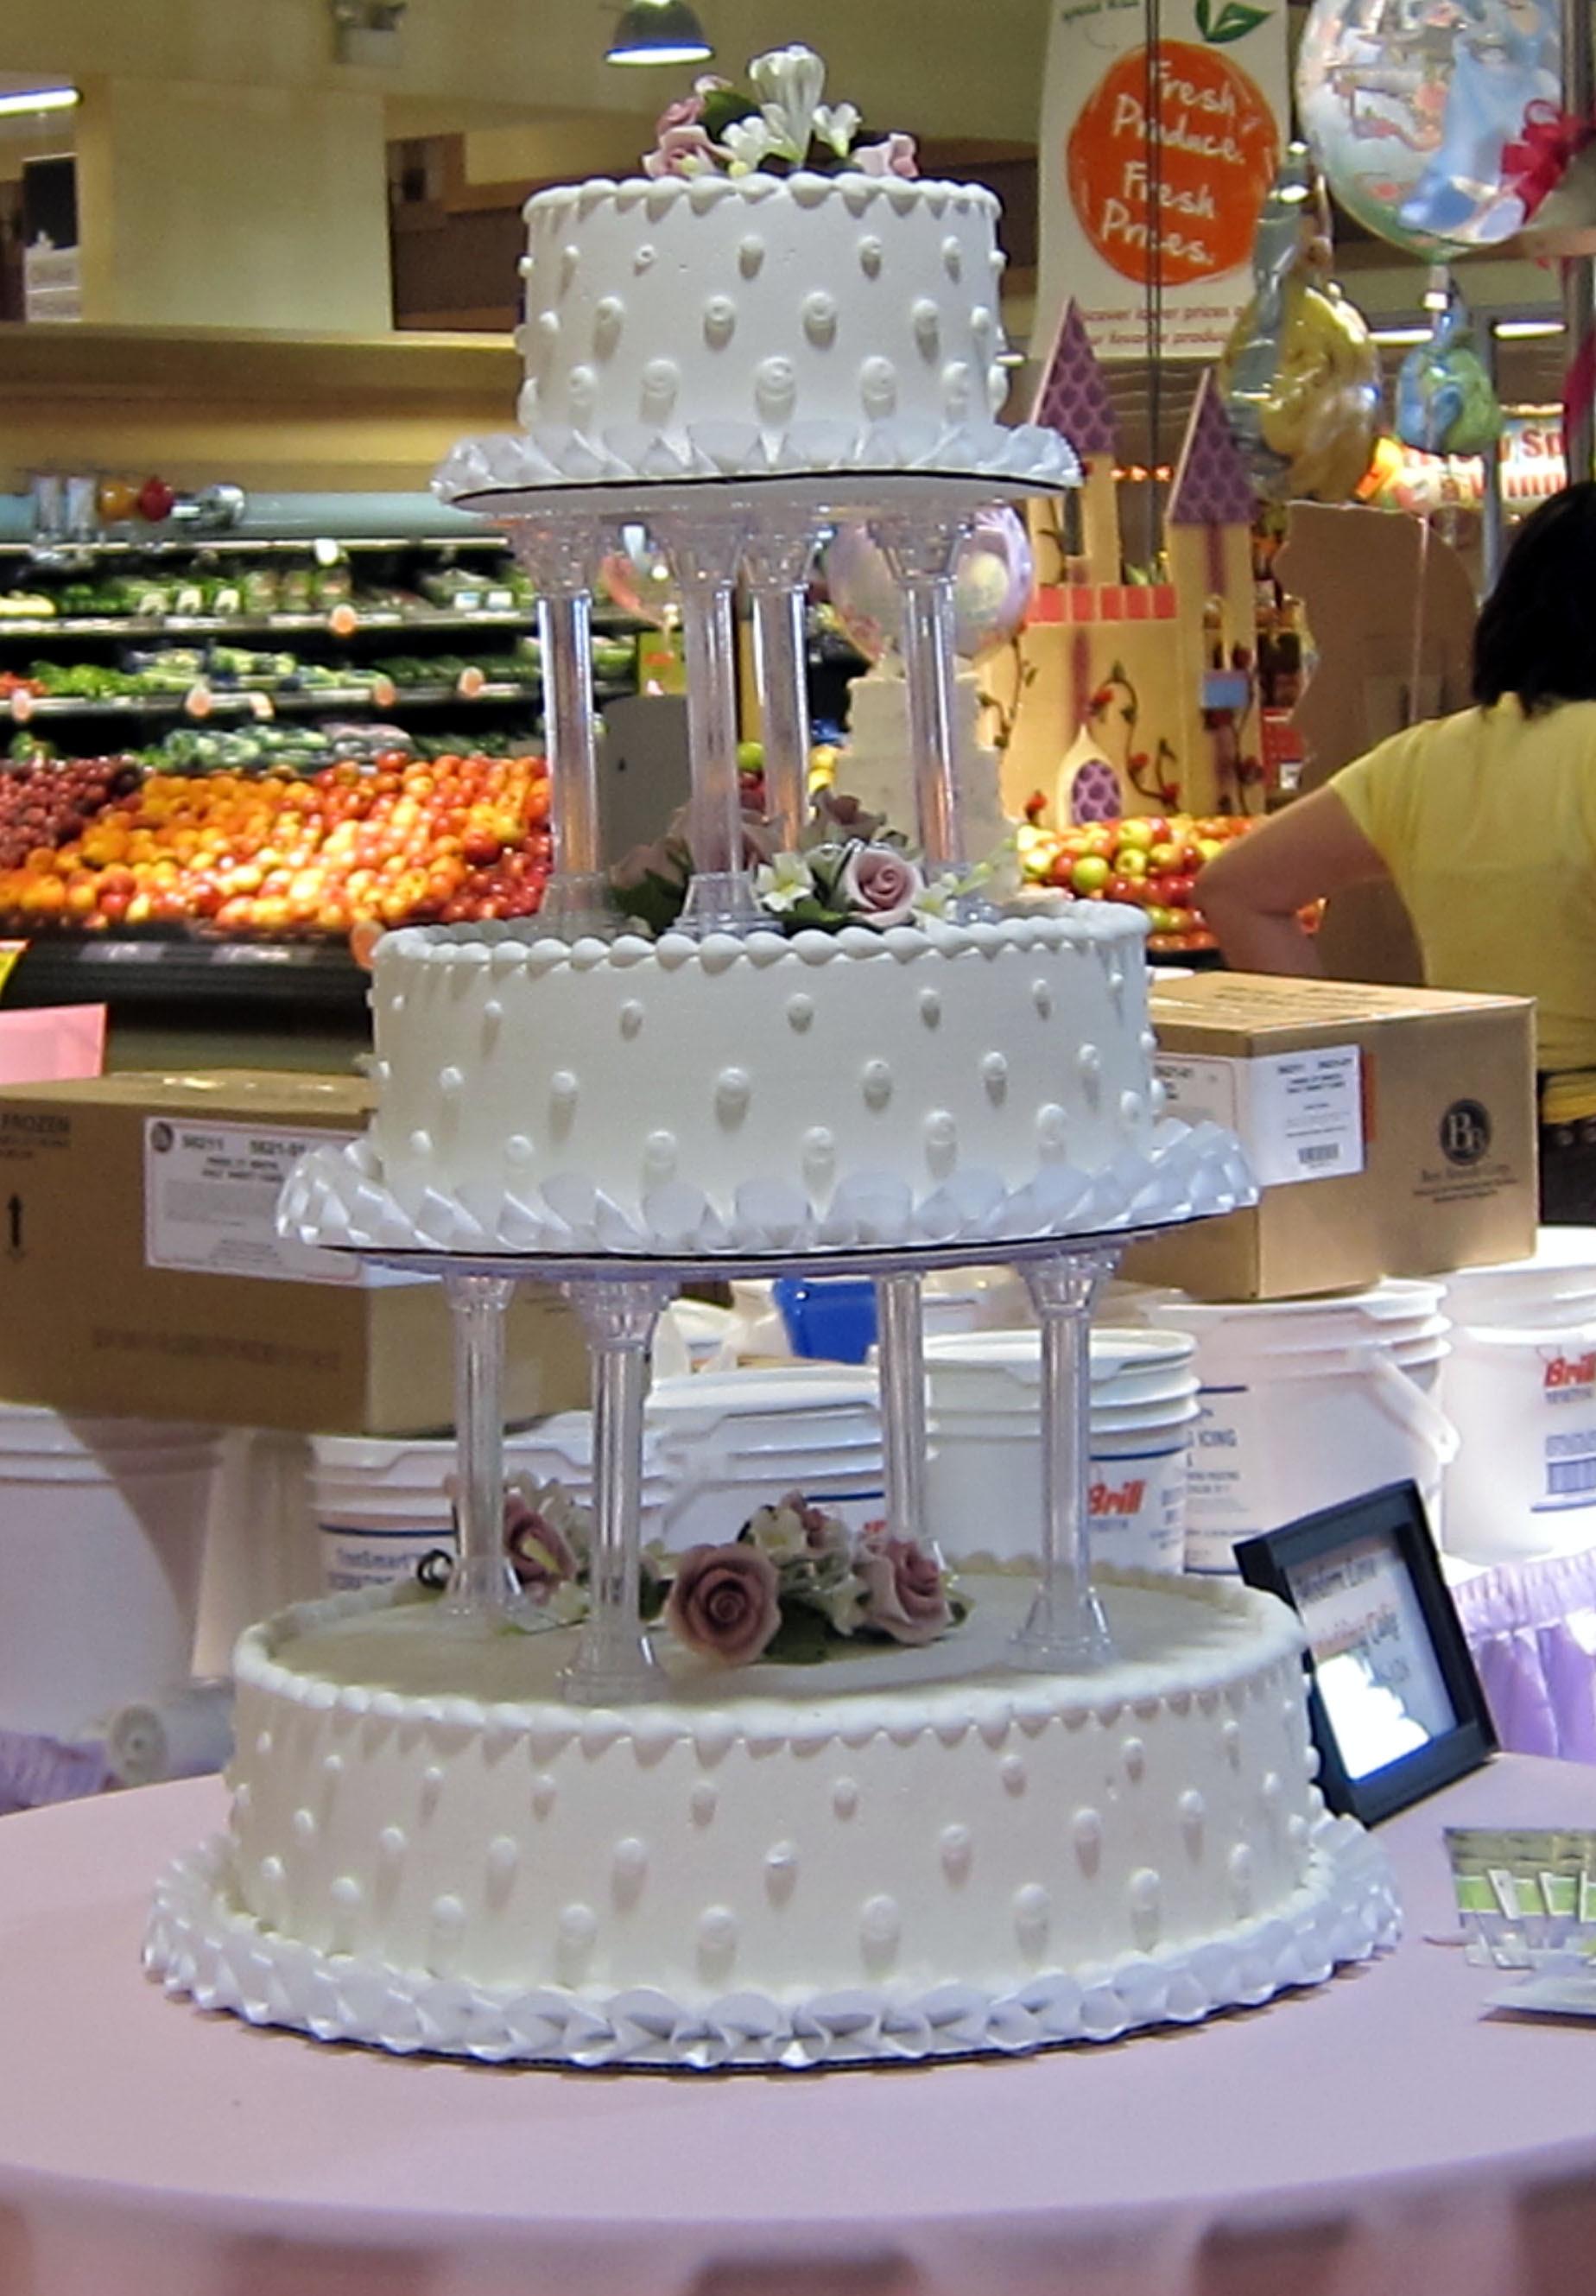 Albertson Bakery Wedding Cakes  Albertsons bakery wedding cakes idea in 2017